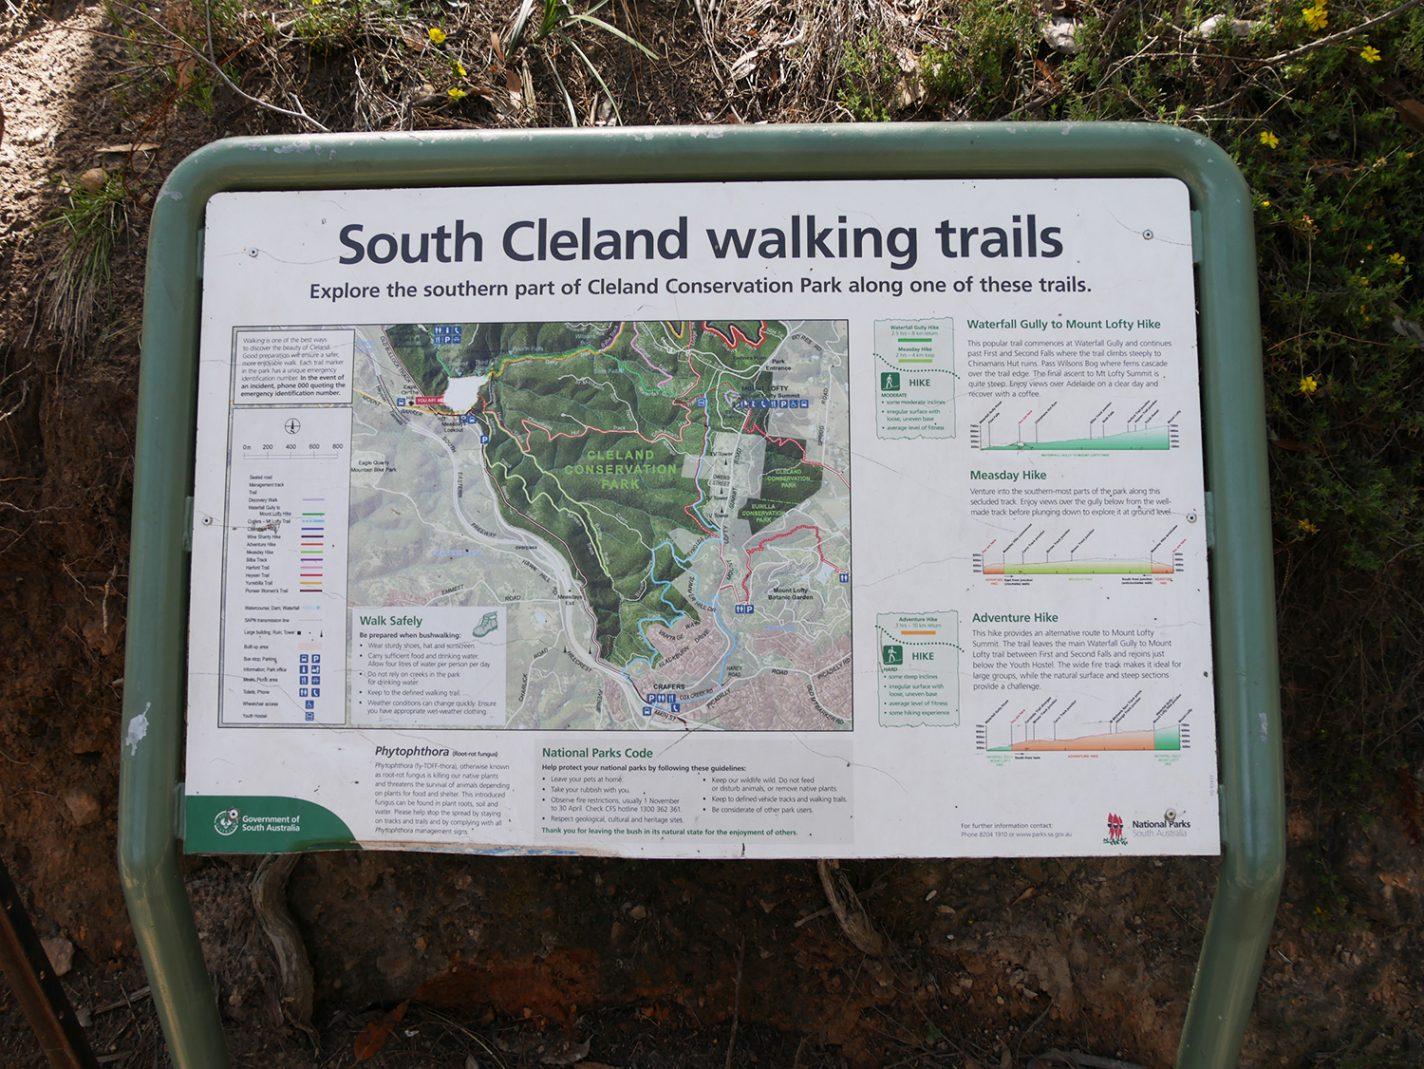 Informatie over de South Cleland walking trails